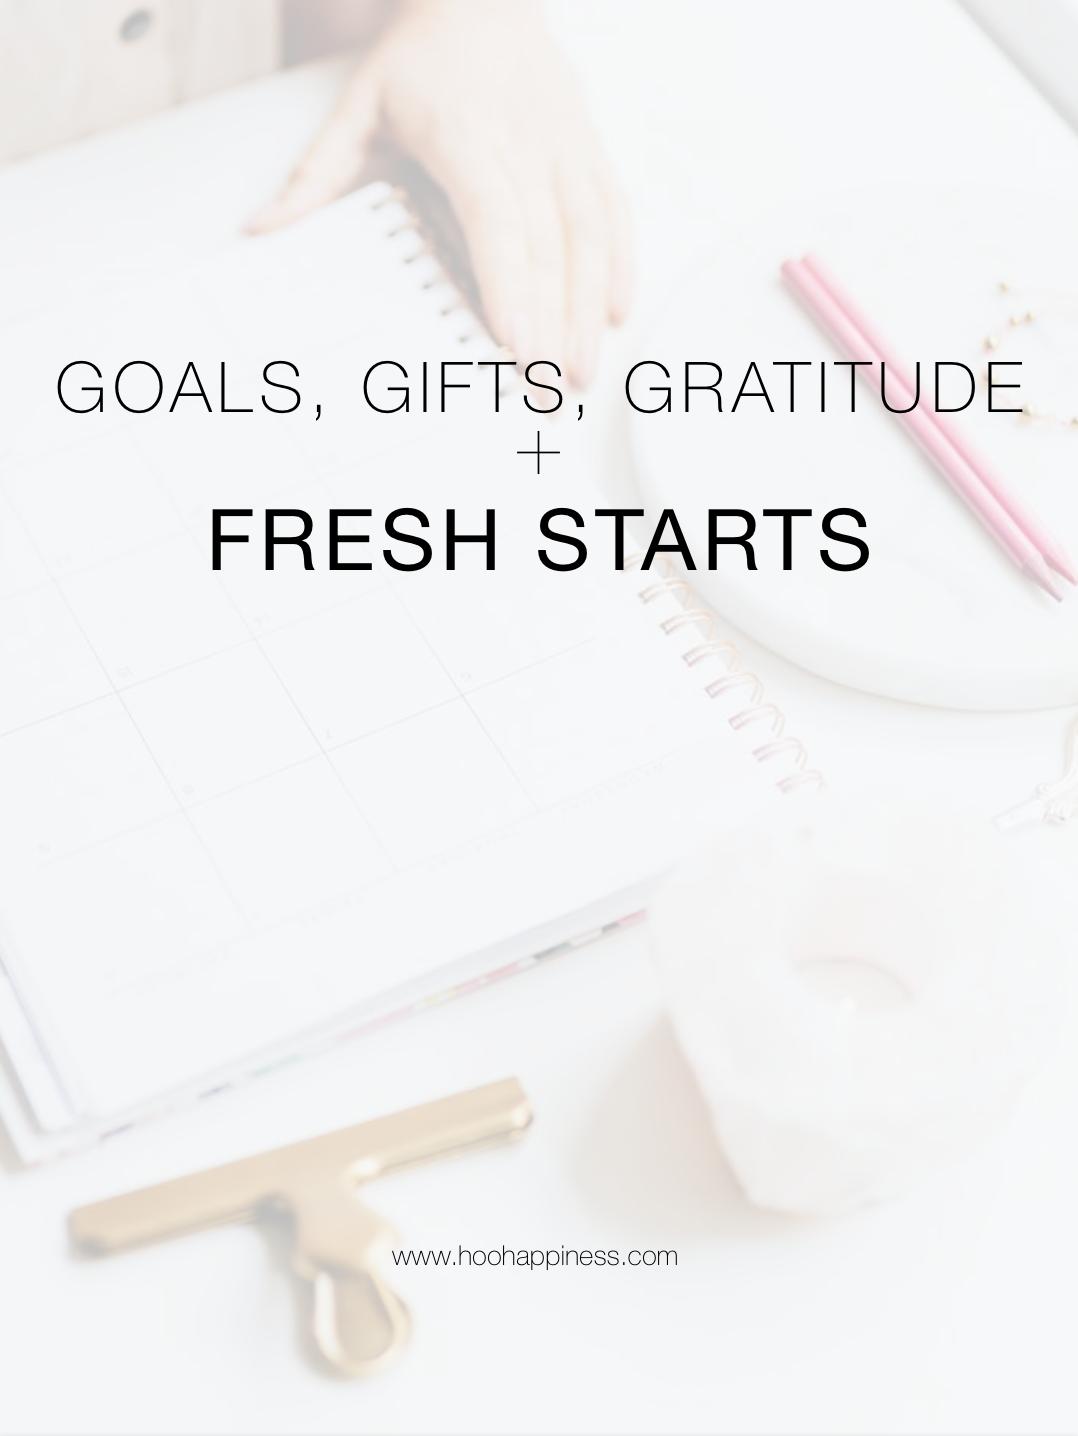 Goals, Gifts, Gratitude & Fresh Starts